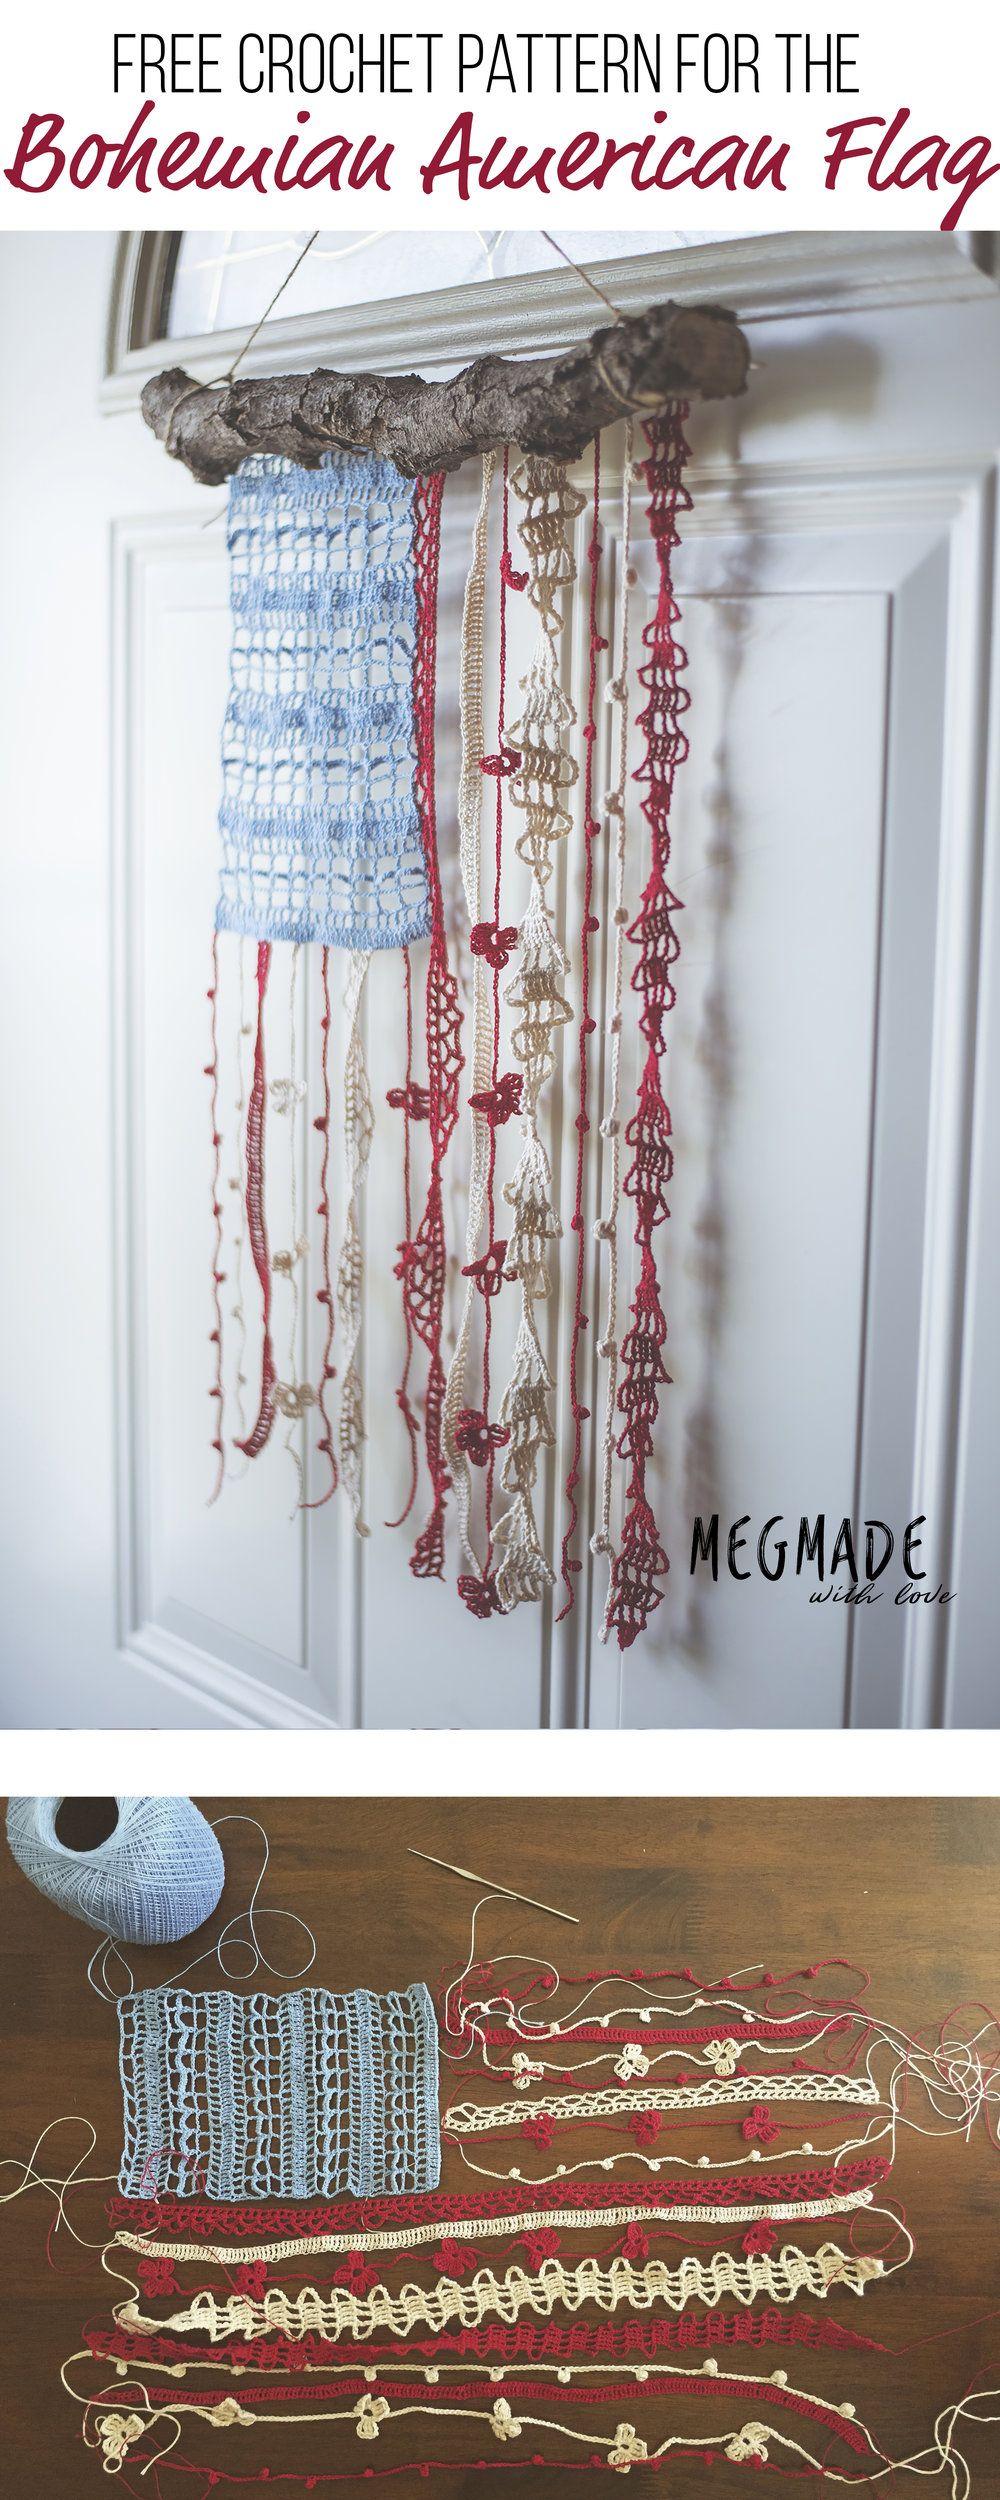 Bohemian American Flag Crochet Pattern | Pinterest